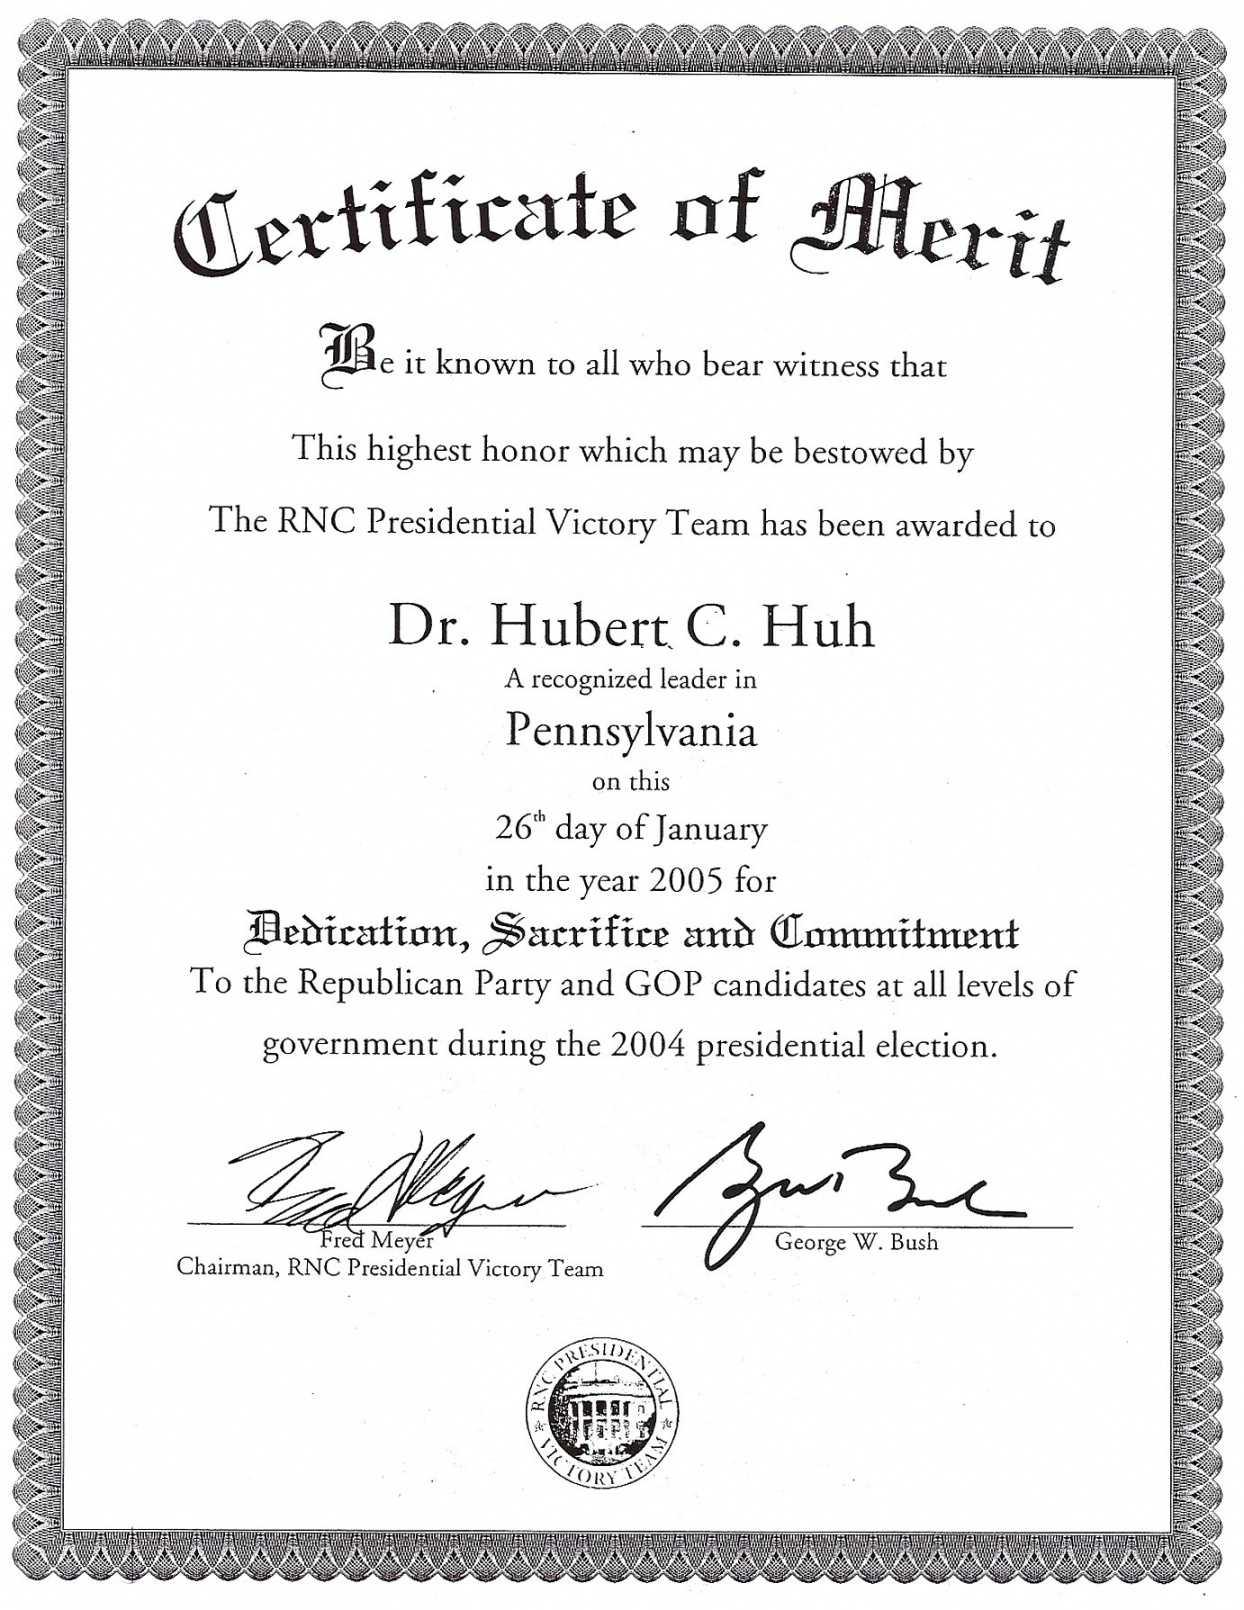 Sales Award Certificate For Sales Certificate Template Pertaining To Sales Certificate Template